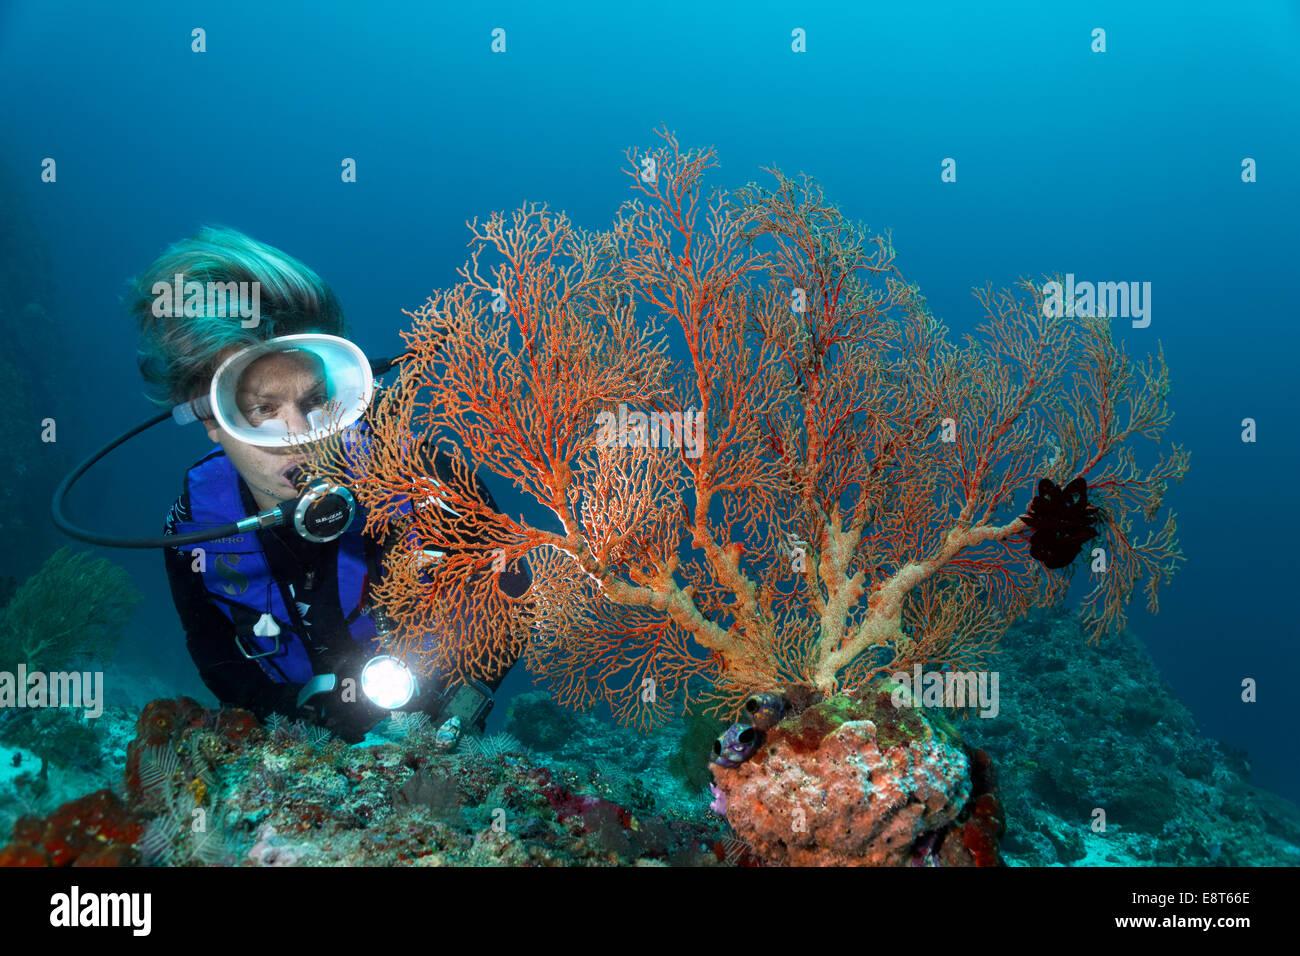 Female Scuba Diver Stockfotos & Female Scuba Diver Bilder - Alamy